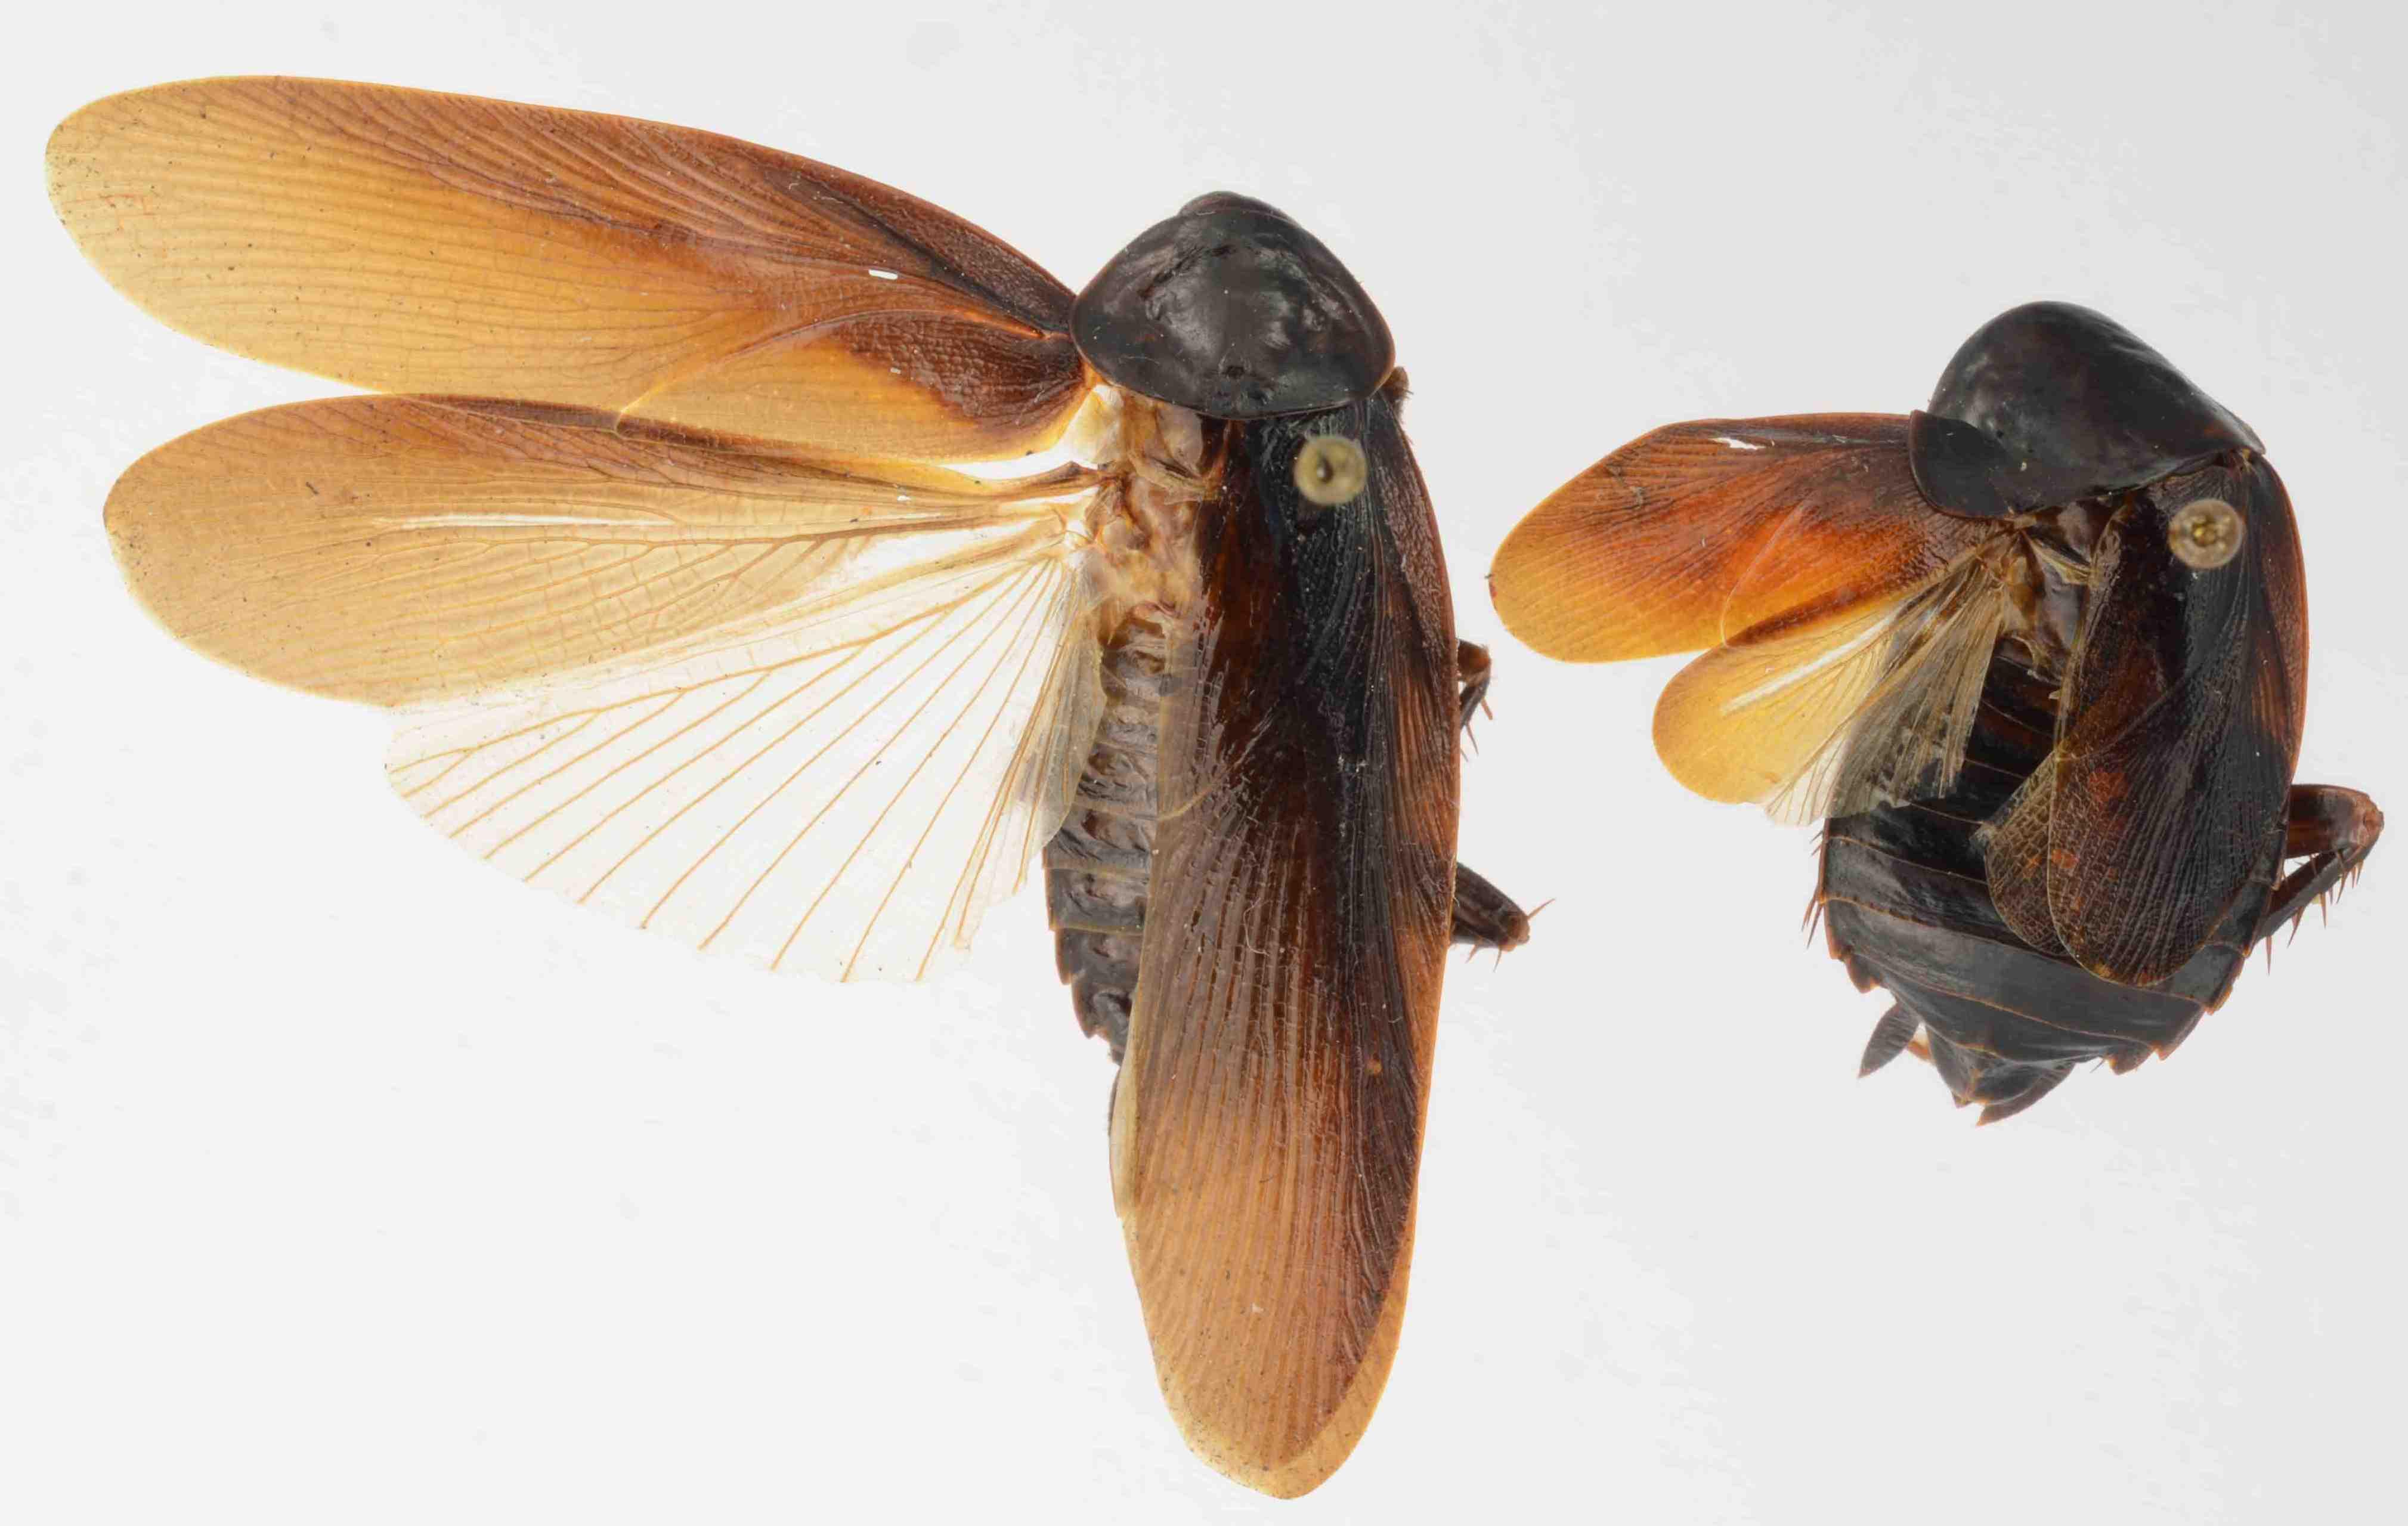 Periplaneta japonica: Η κατσαρίδα που επιβιώνει στο δριμύ ψύχος